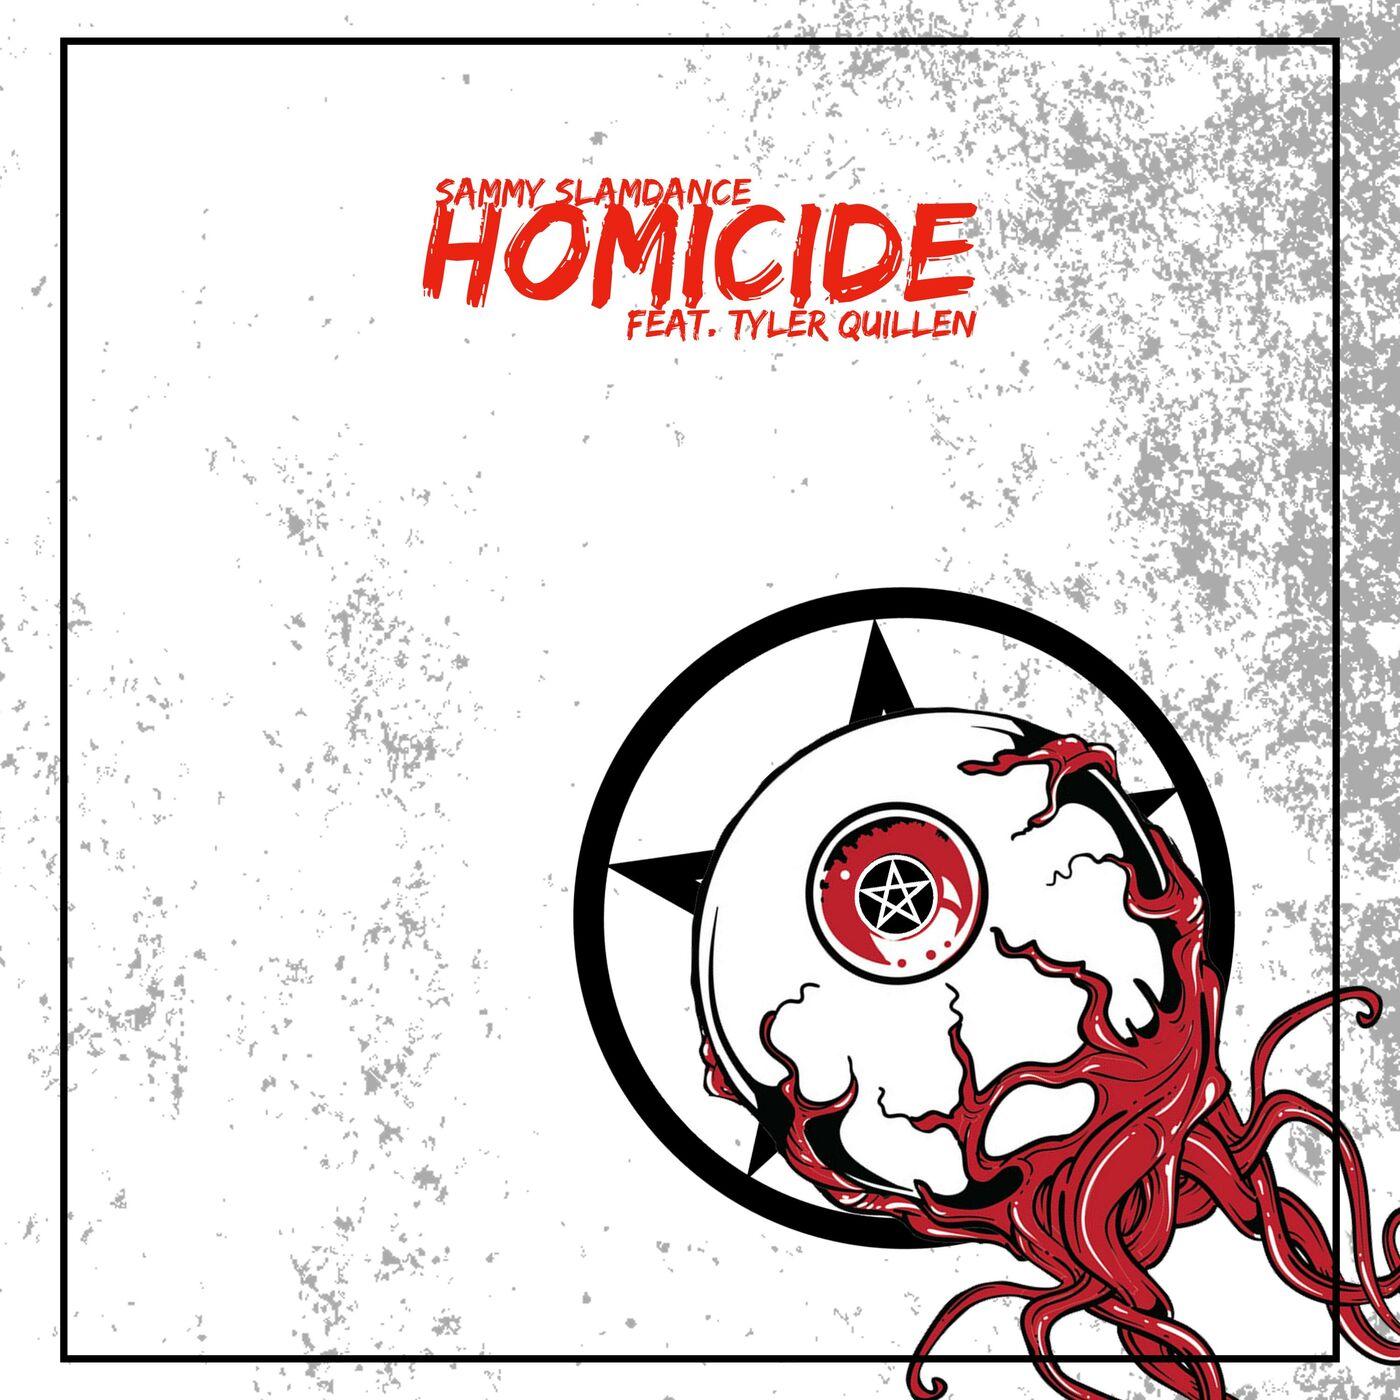 Sammy SlamDance - Homicide [single] (2020)